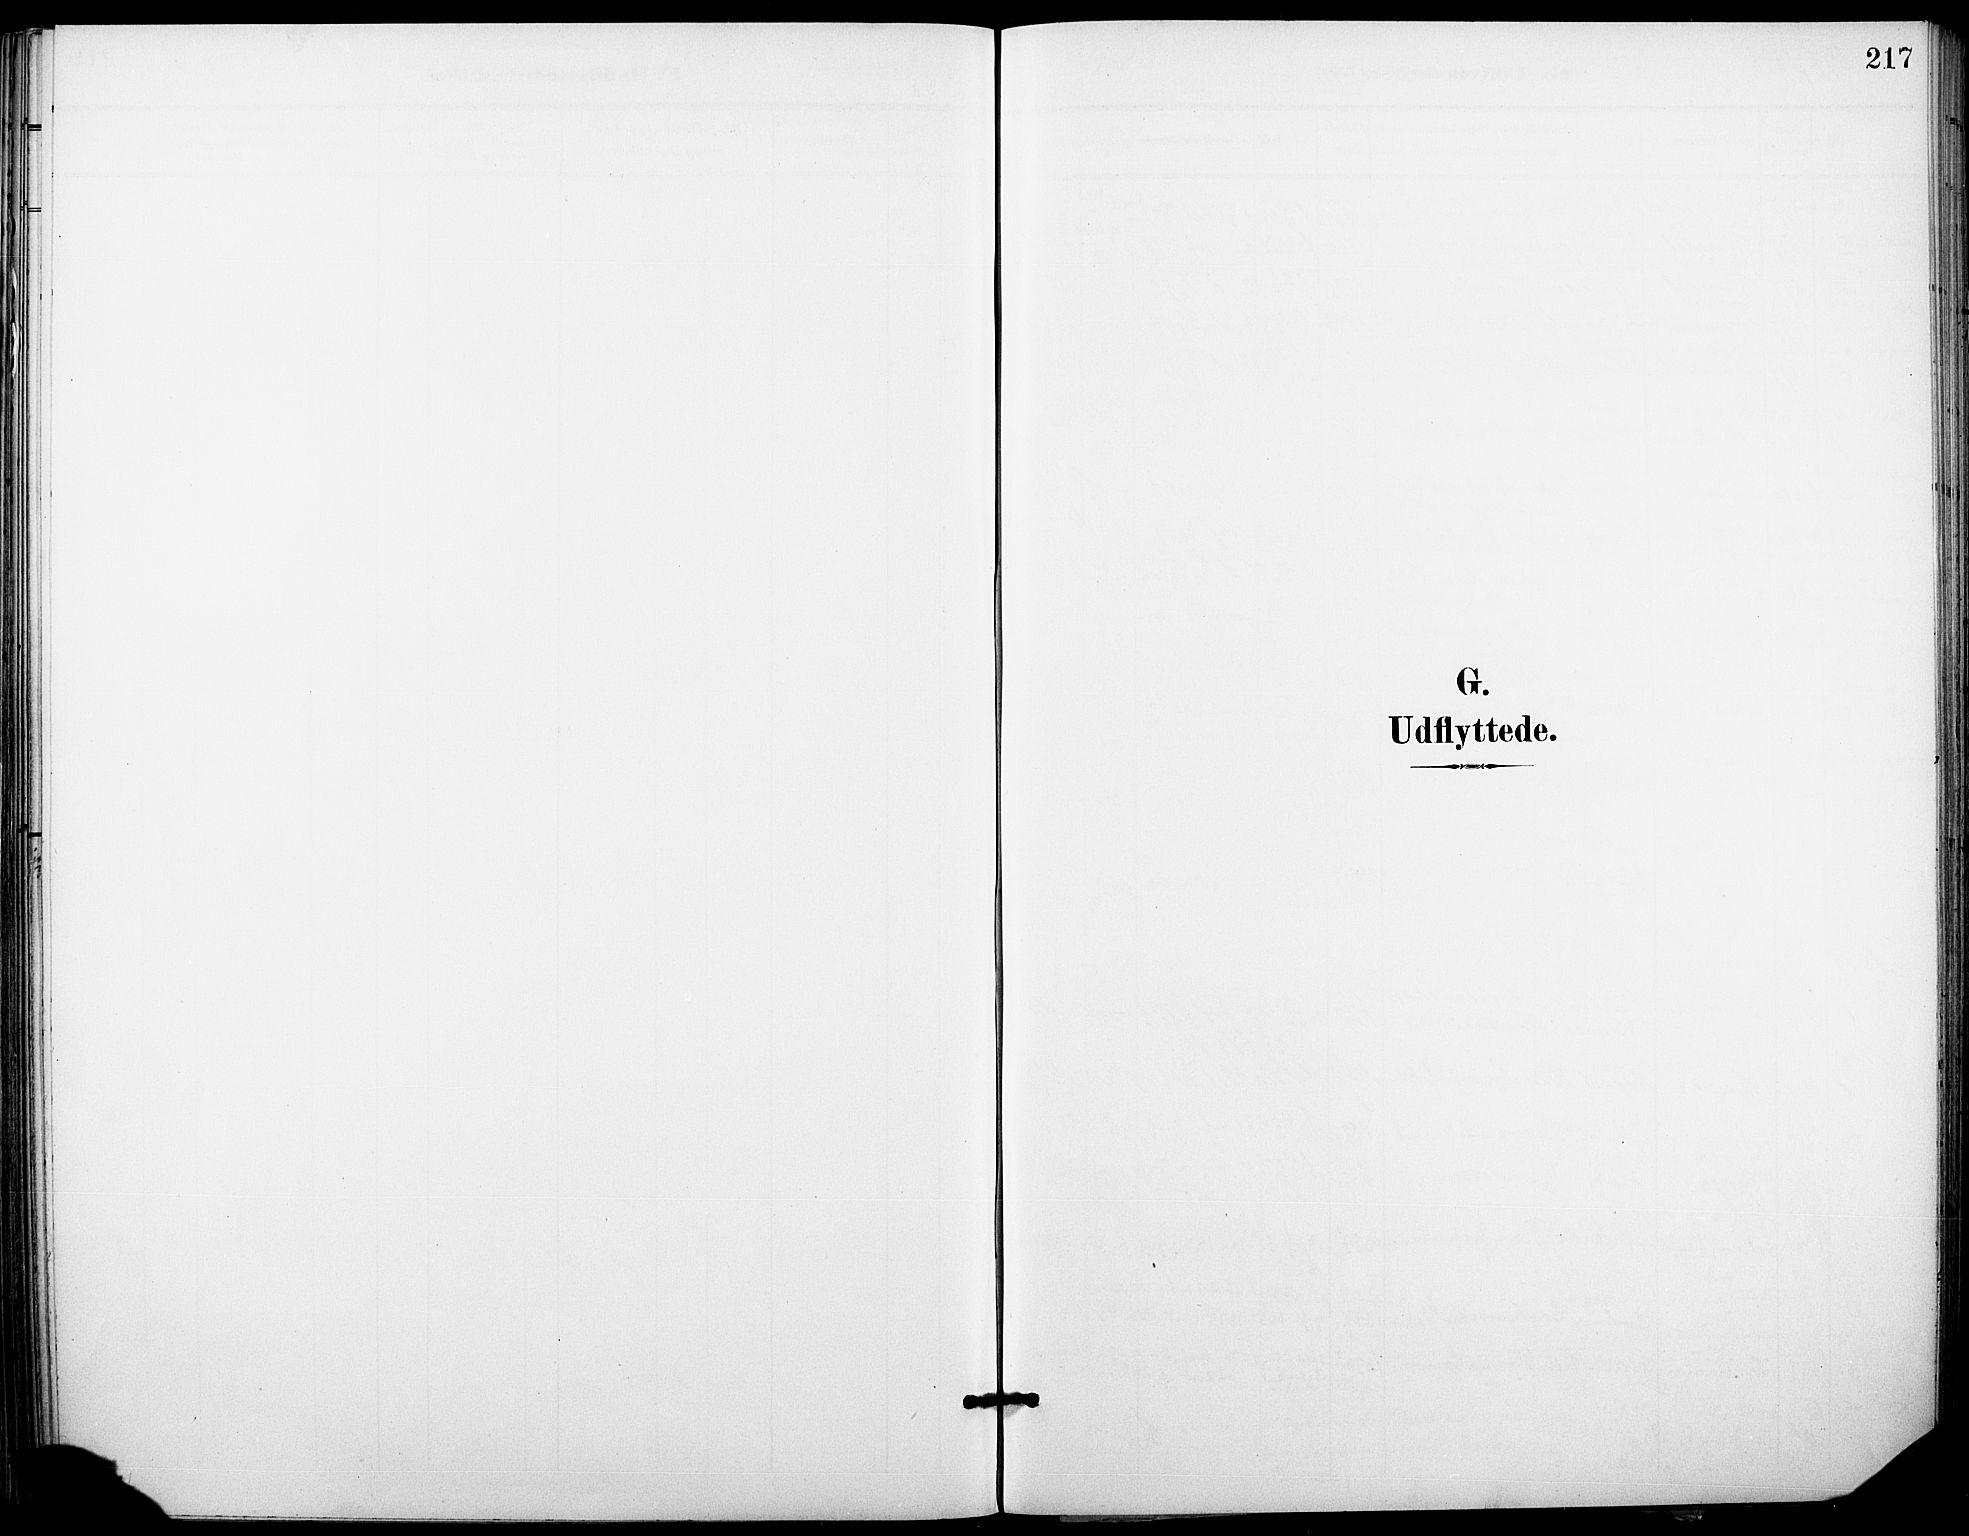 SAKO, Holla kirkebøker, F/Fa/L0010: Ministerialbok nr. 10, 1897-1907, s. 217